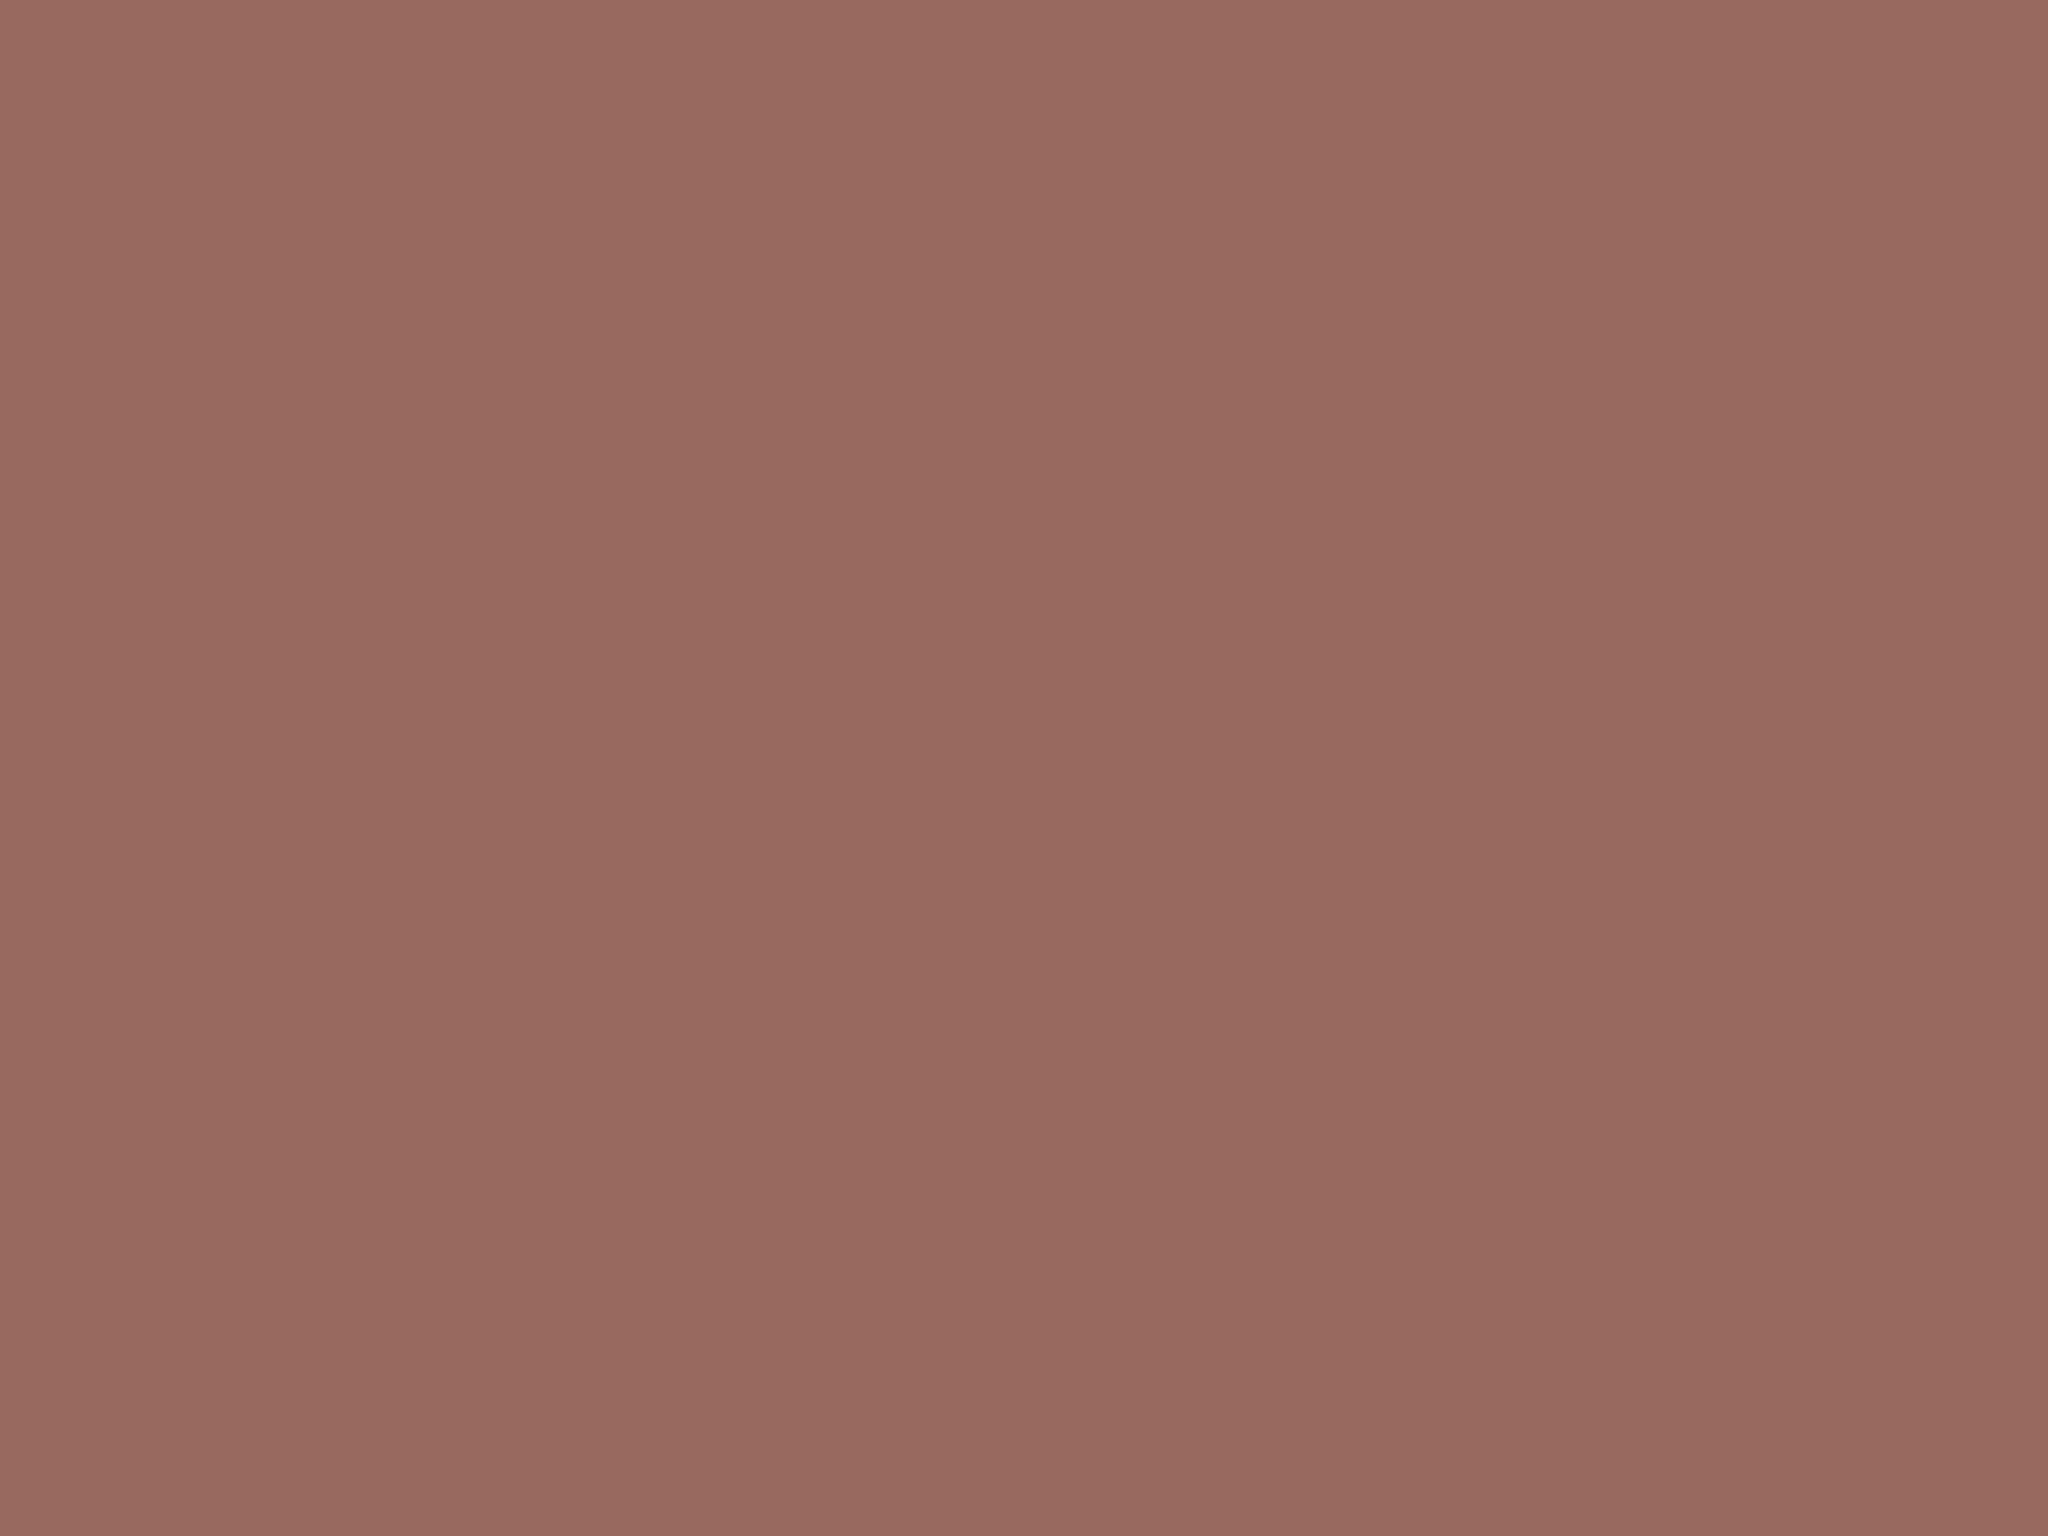 2048x1536 Dark Chestnut Solid Color Background